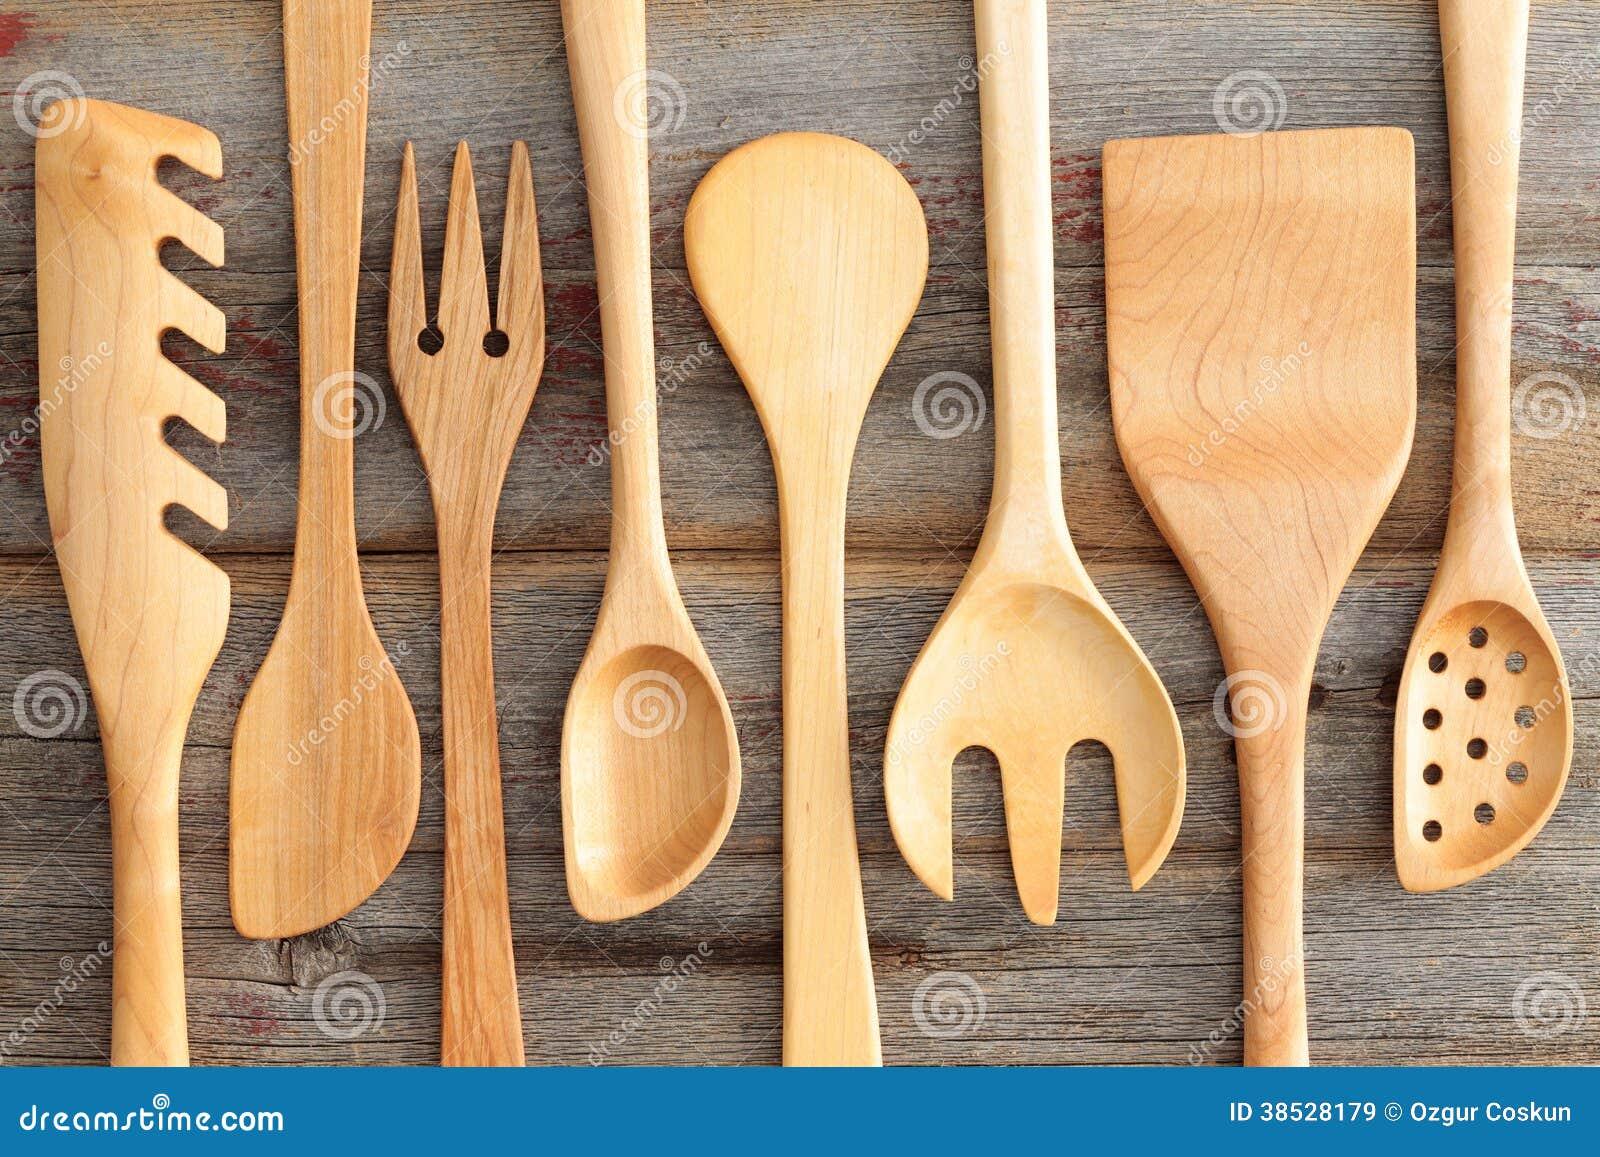 Set of rustic wooden handcrafted kitchen utensils royalty for Wooden kitchen utensils